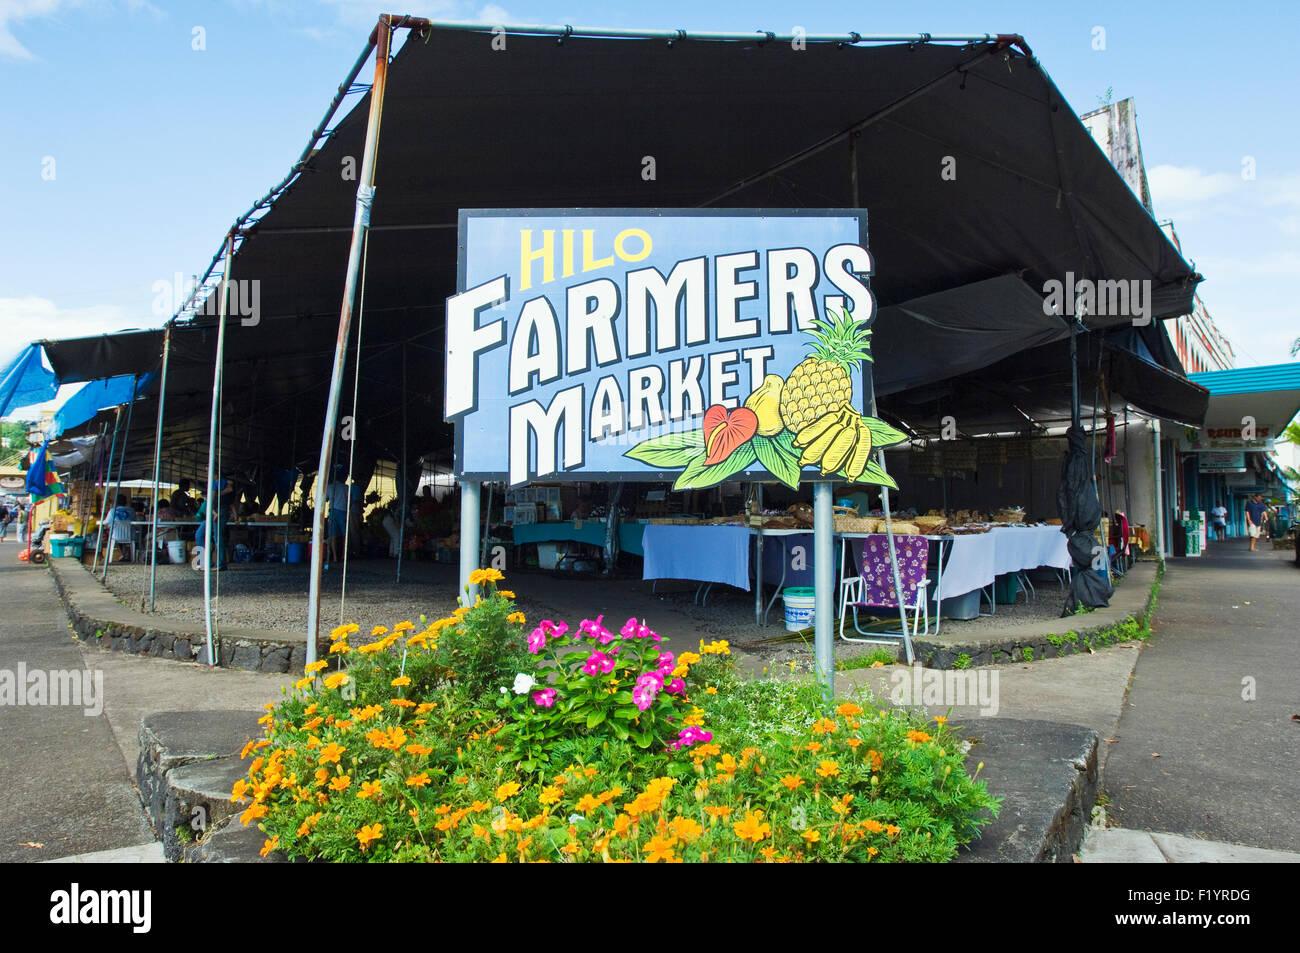 Hilo Farmers market in Hilo, Hawaii - Stock Image